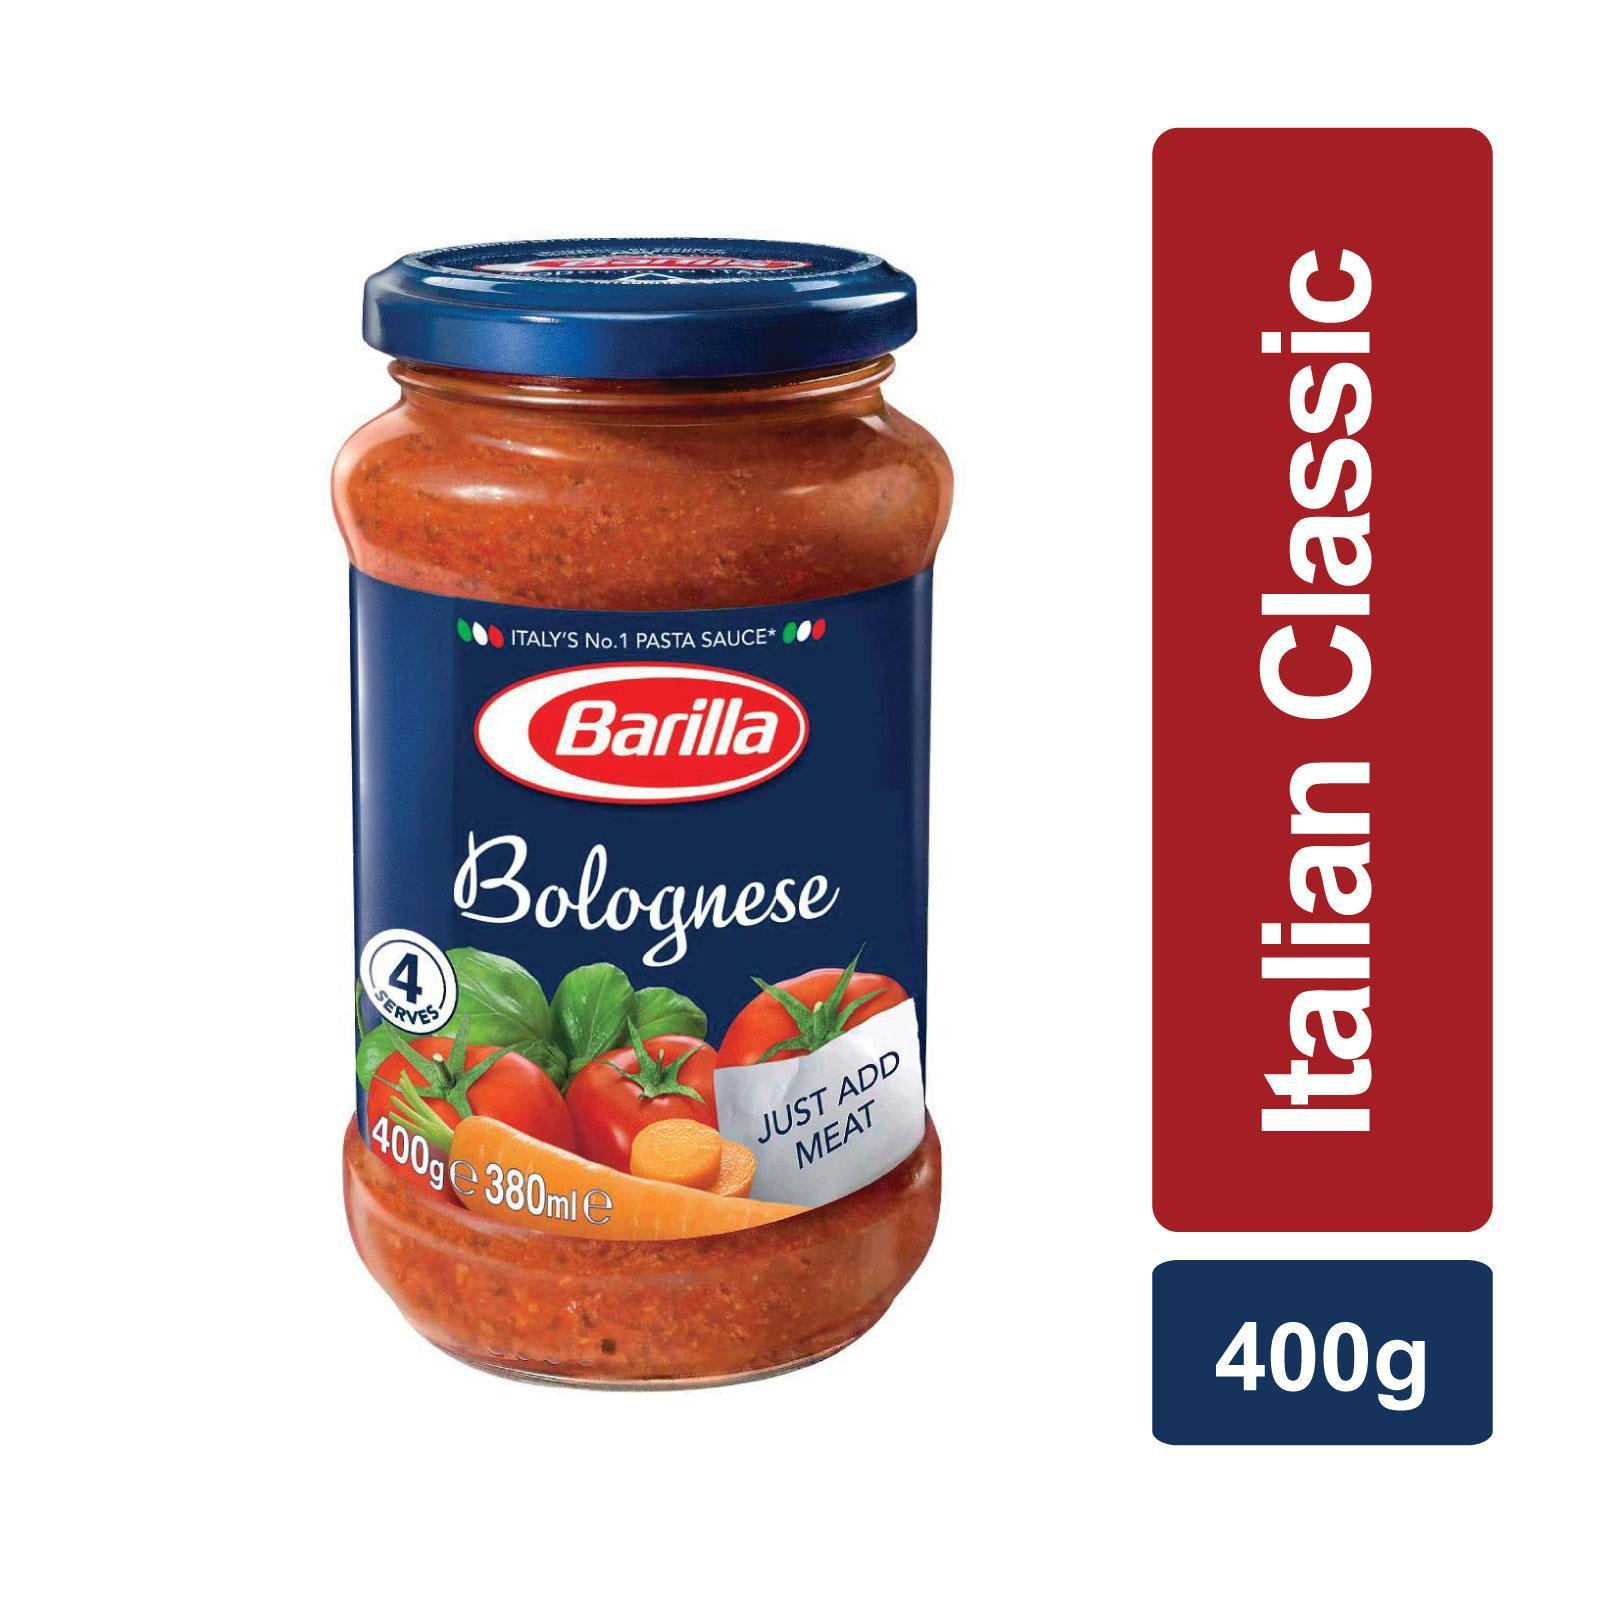 Barilla Base for Bolognese Pasta Sauce